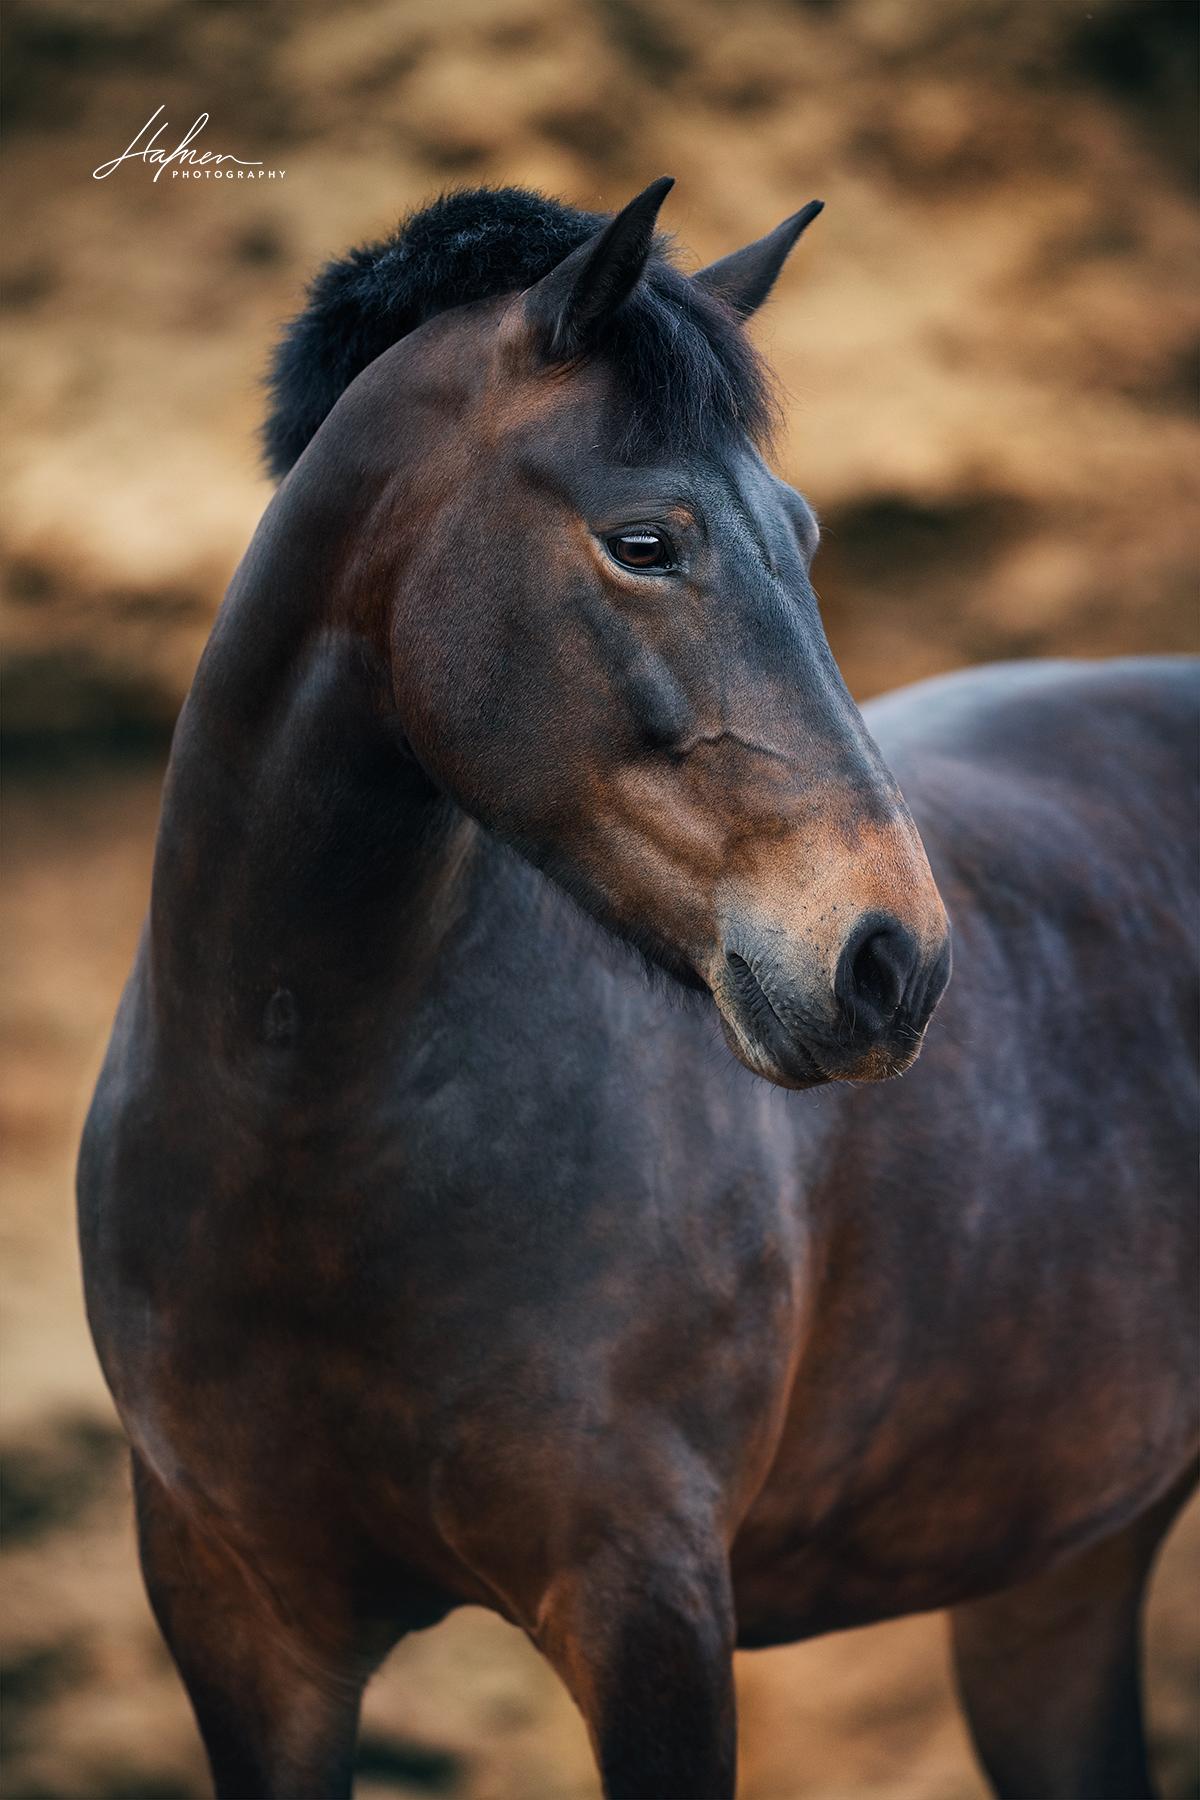 Dunkelbraune Pony Stute Im Portrait Pferd Bilder Foto Fotografie Fotoshooting Pferdefotografie P Pferde Fotografie Pferdefotografie Pferdefotos